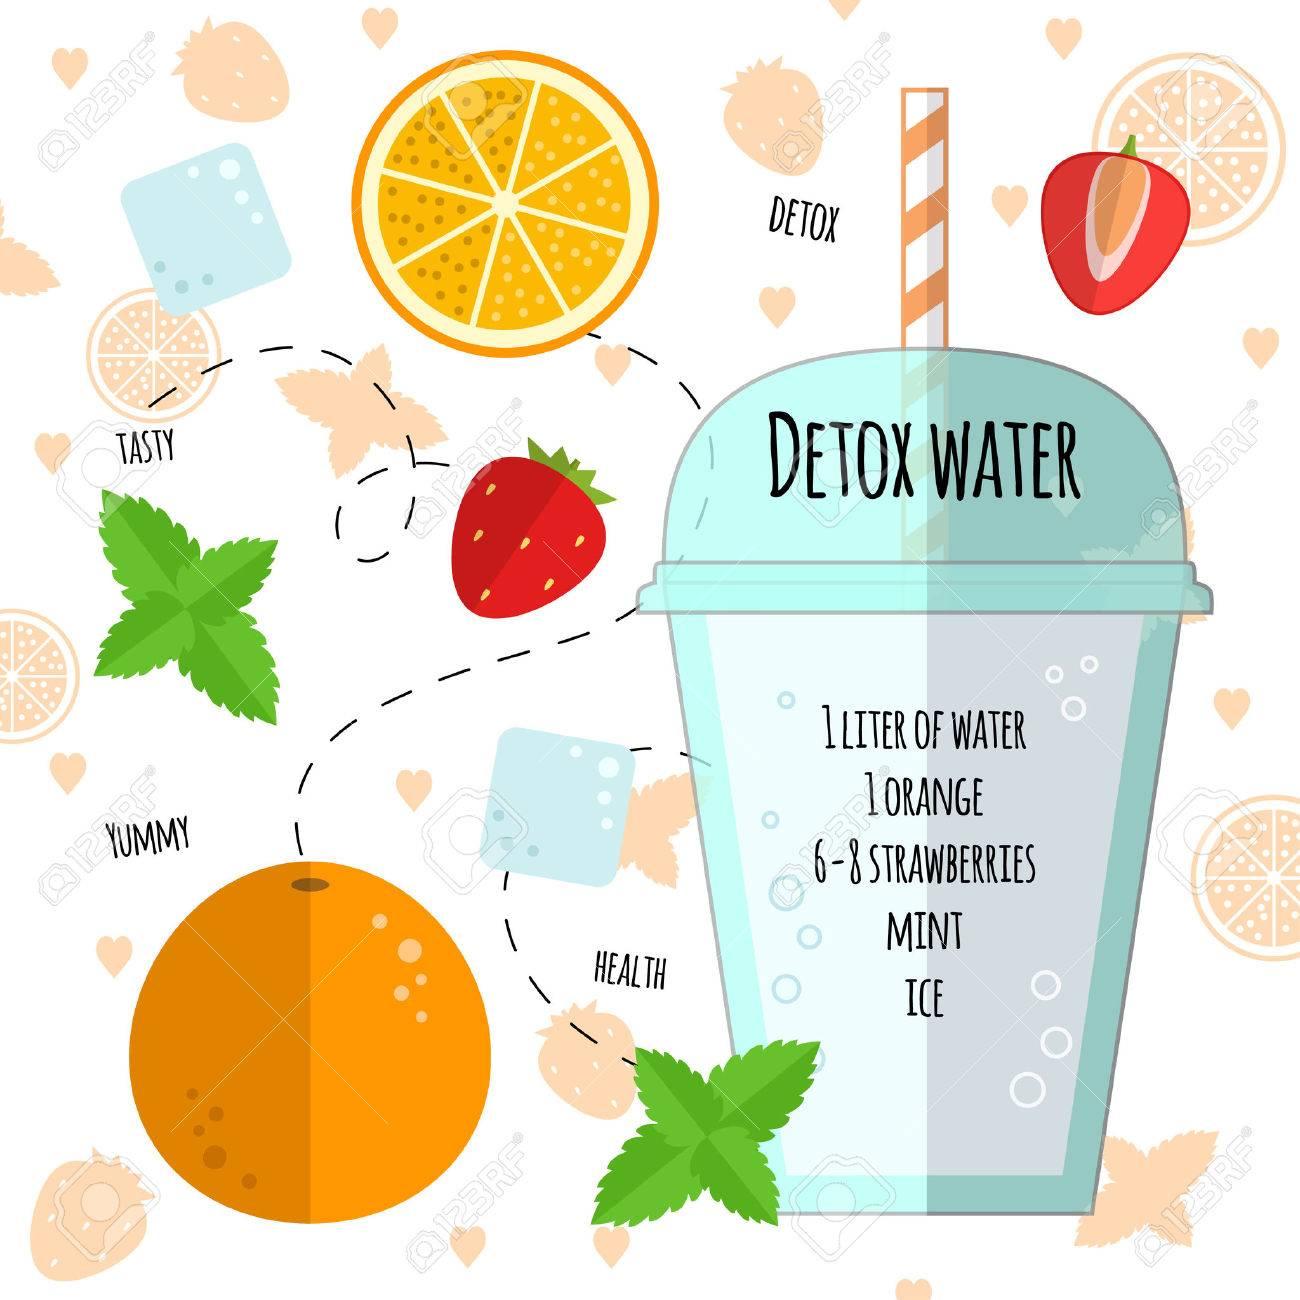 Recipe Detox Water With Orange Mint Strawberry Ice Vector